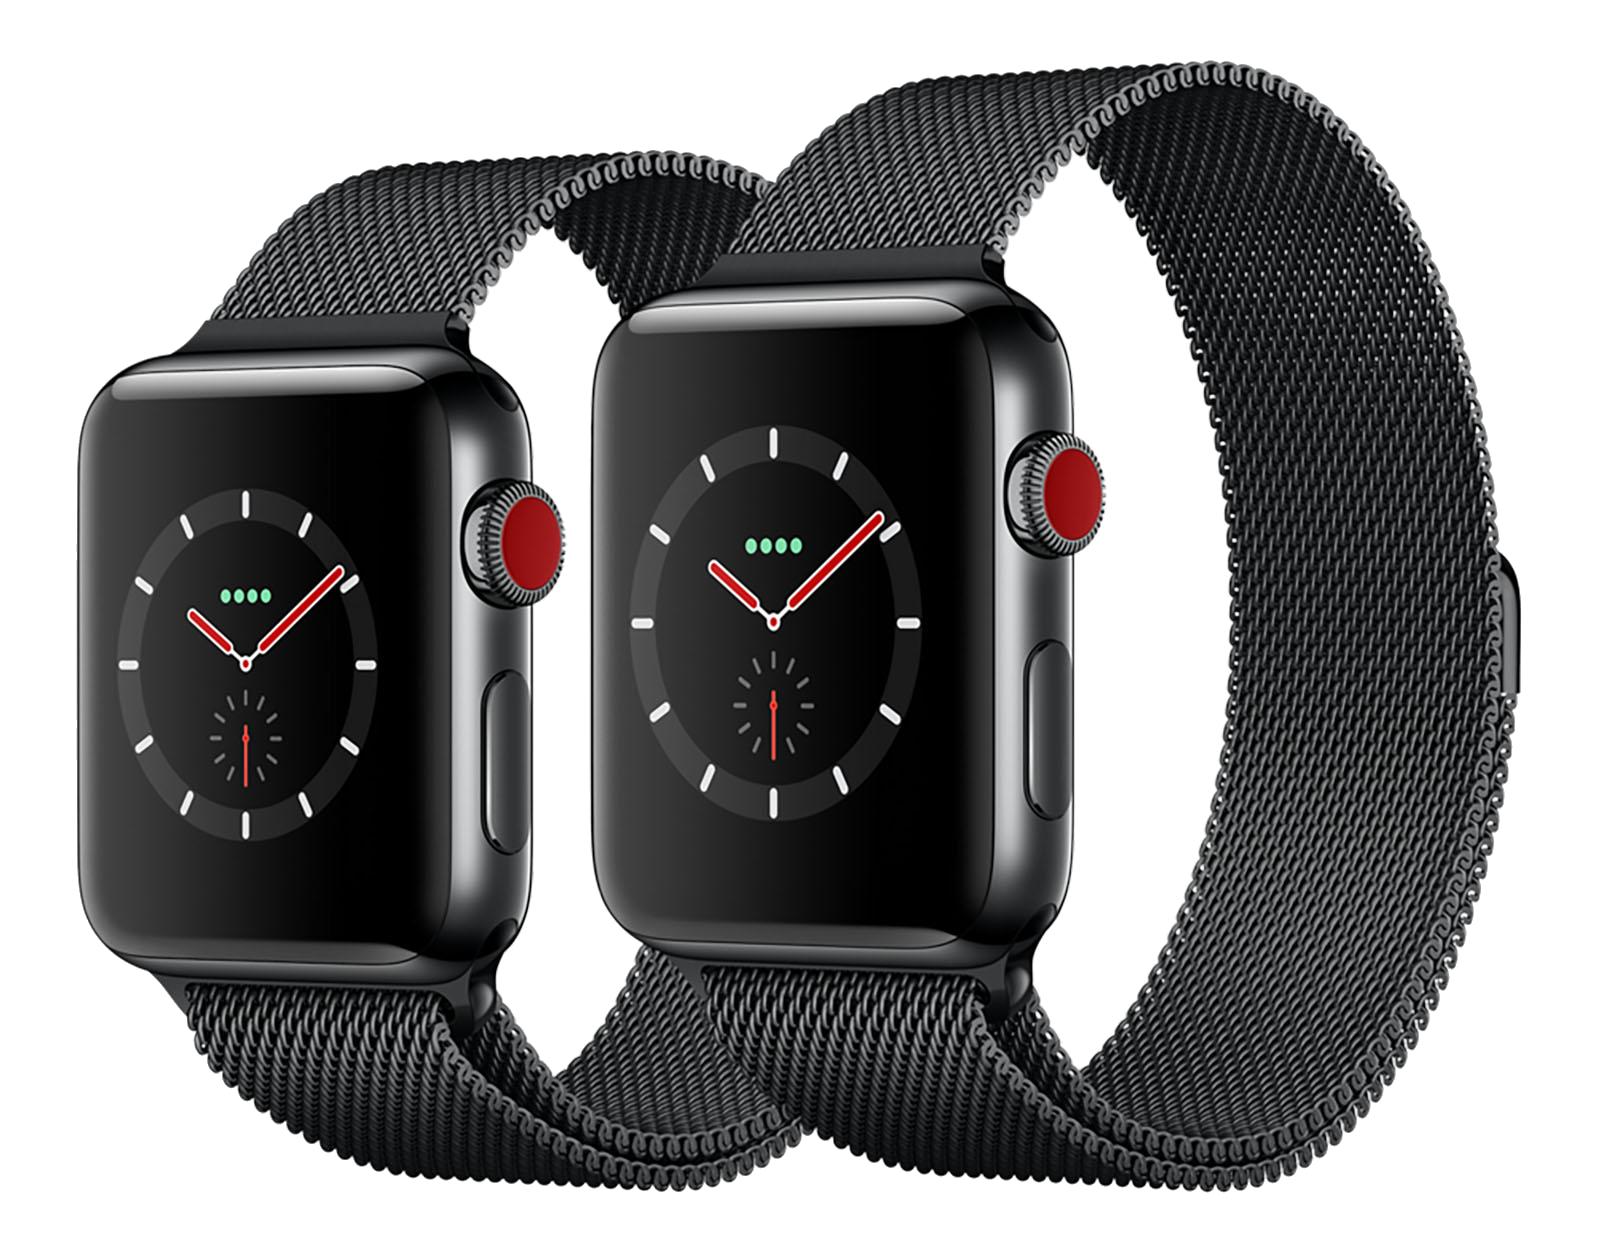 Best Apple Watch Series 3 deals on GPS plus cellular models